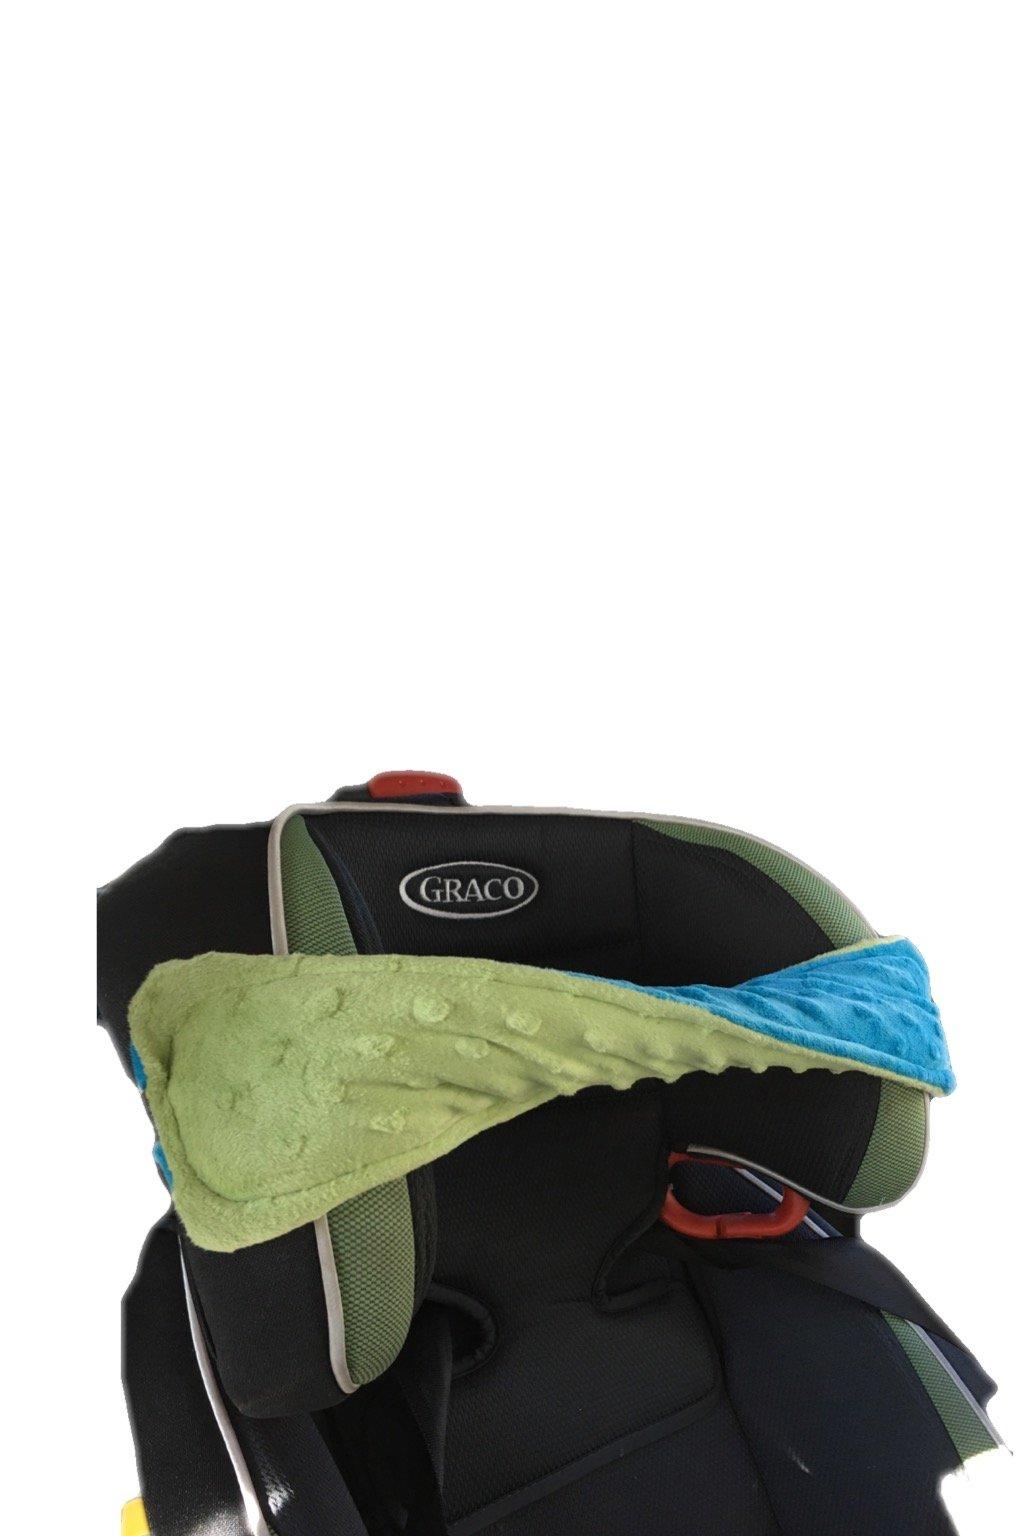 Big Bandz car seat pillow (Green/blue)